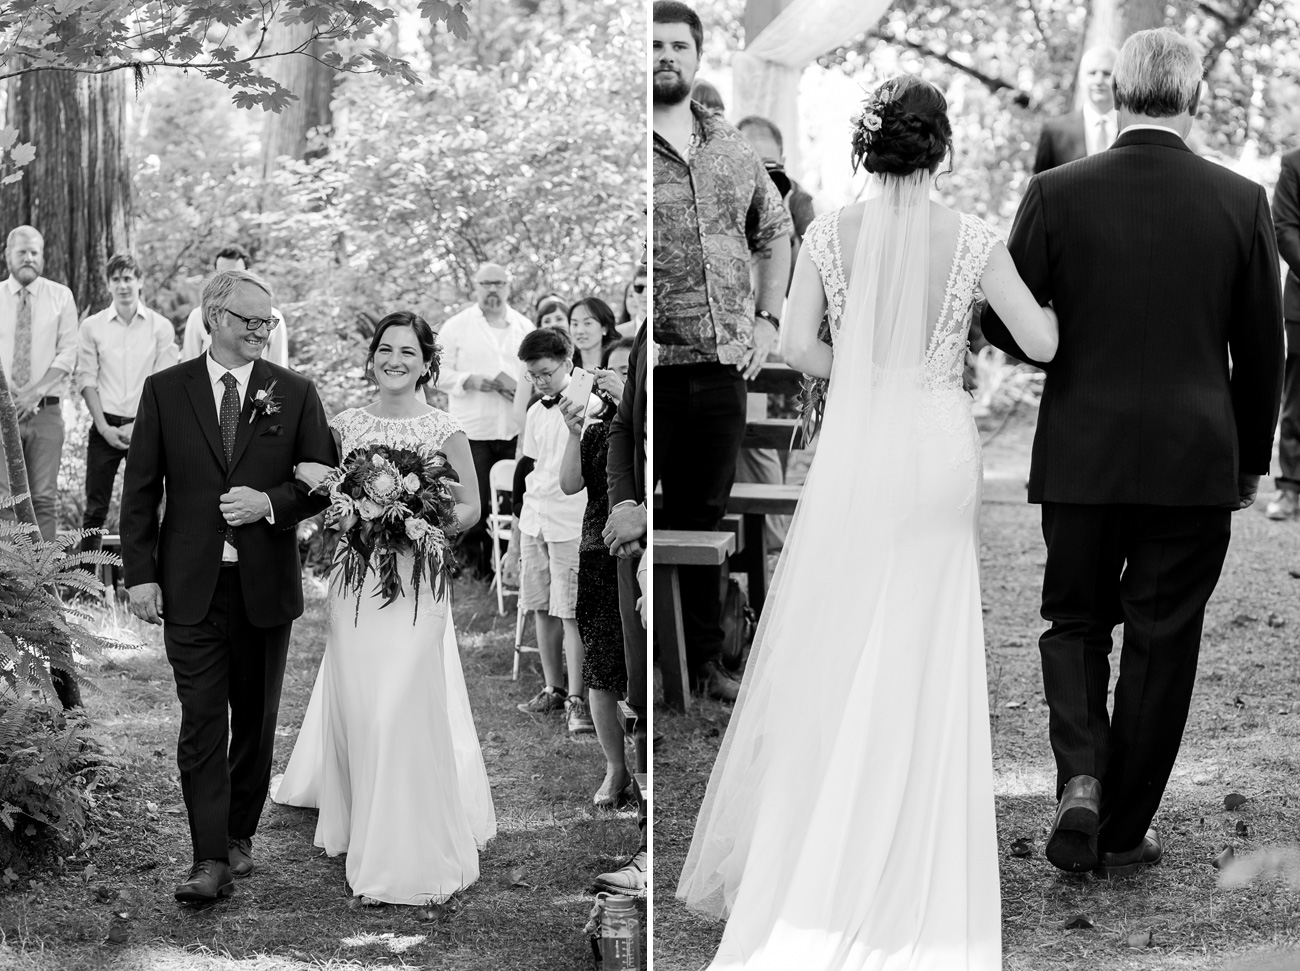 loloma-lodge-oregon-wedding-39 Loloma Lodge Oregon Wedding | Anna & Justin | Traditional Korean Tea Ceremony